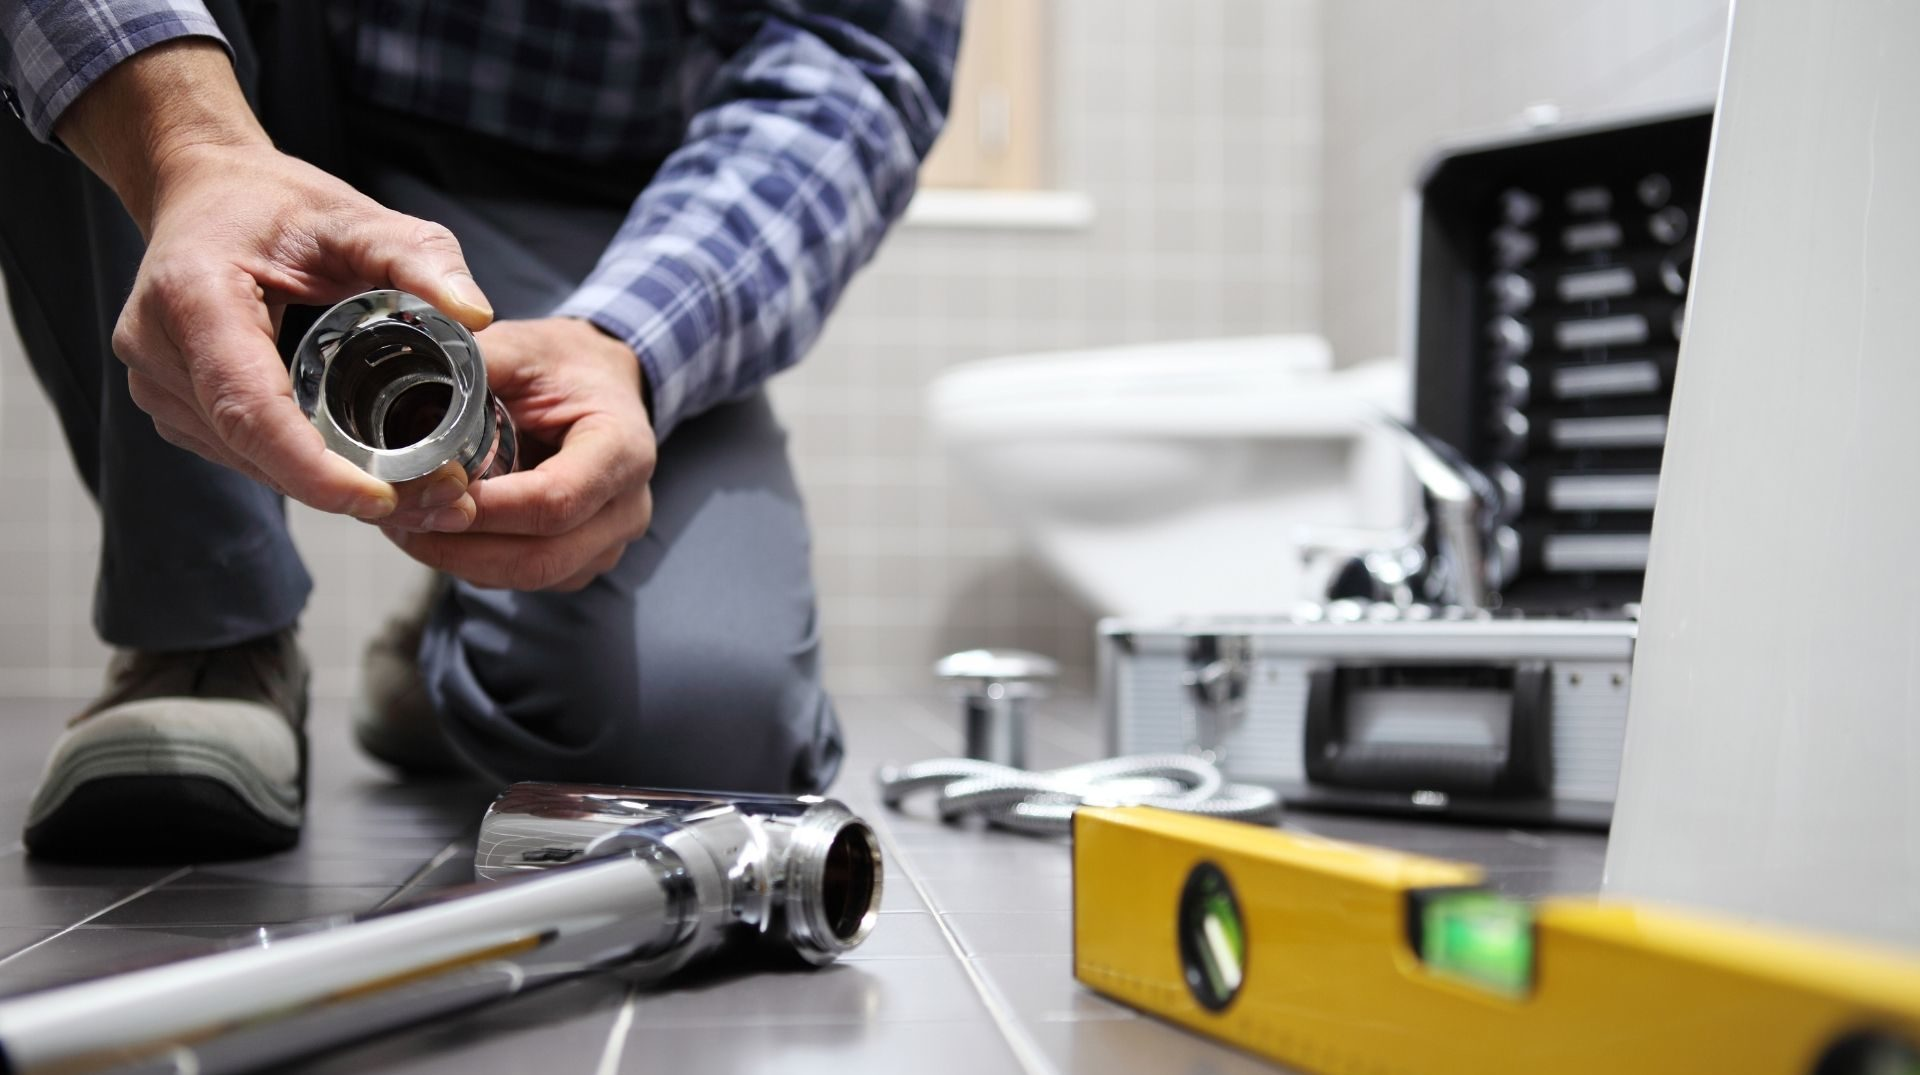 DIY Plumbing – What Can I Do Myself?